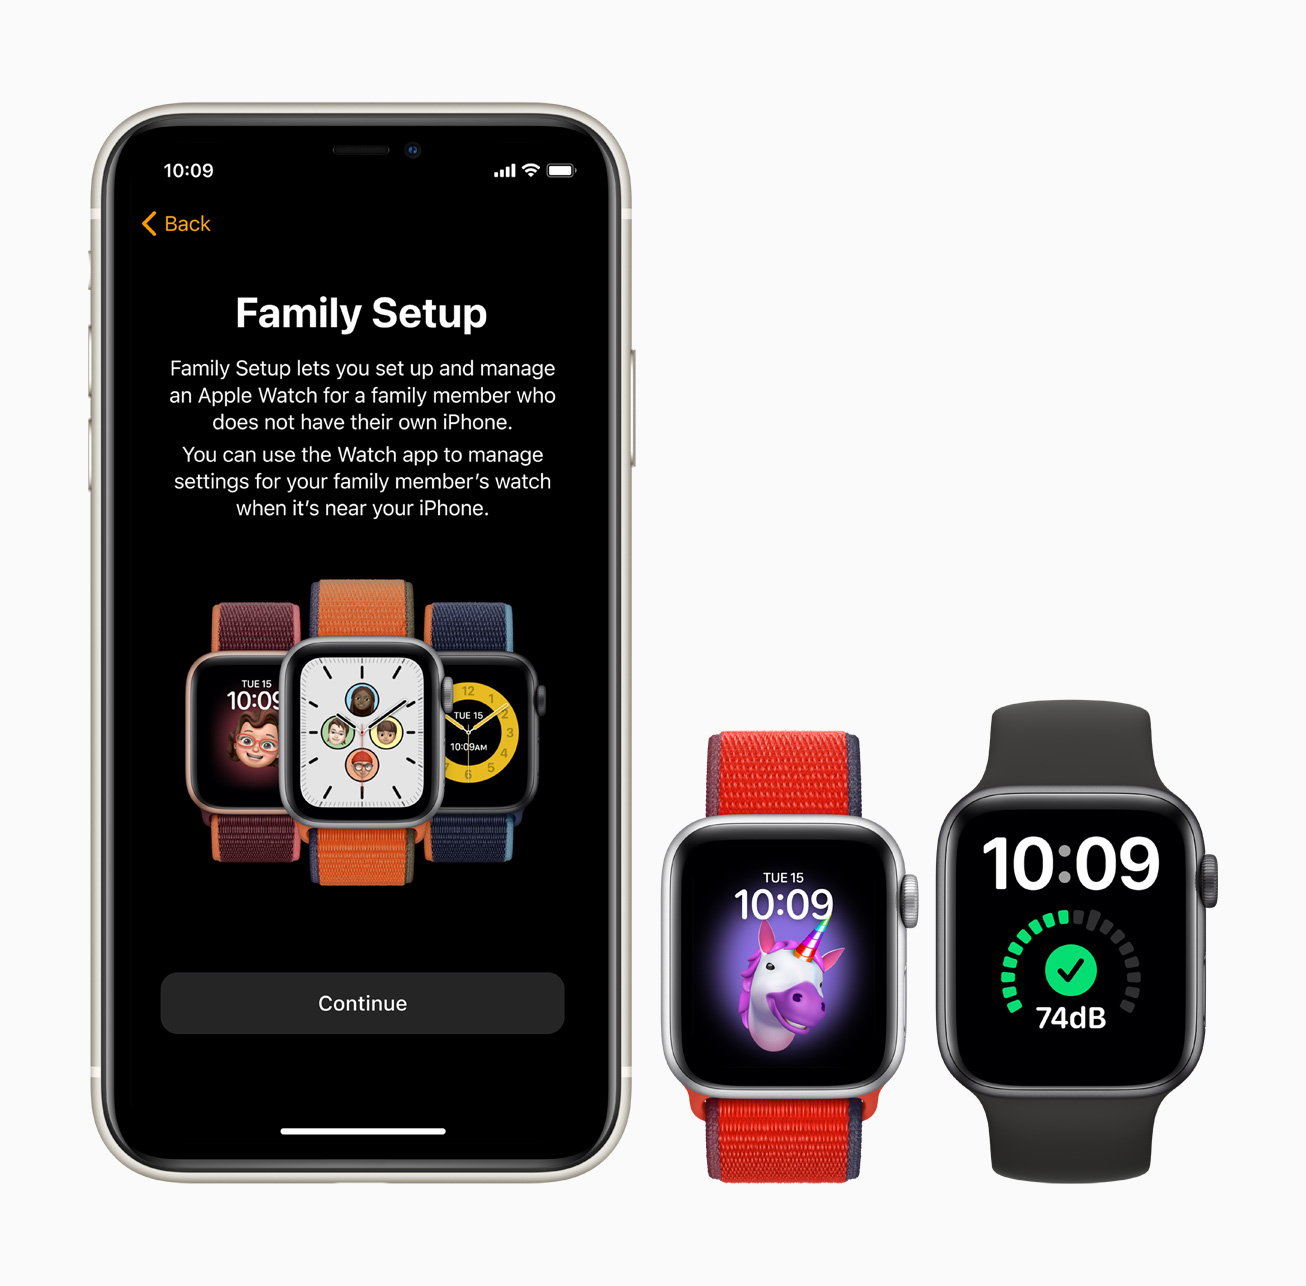 Apple watch family setup iphone11 screen 09152020